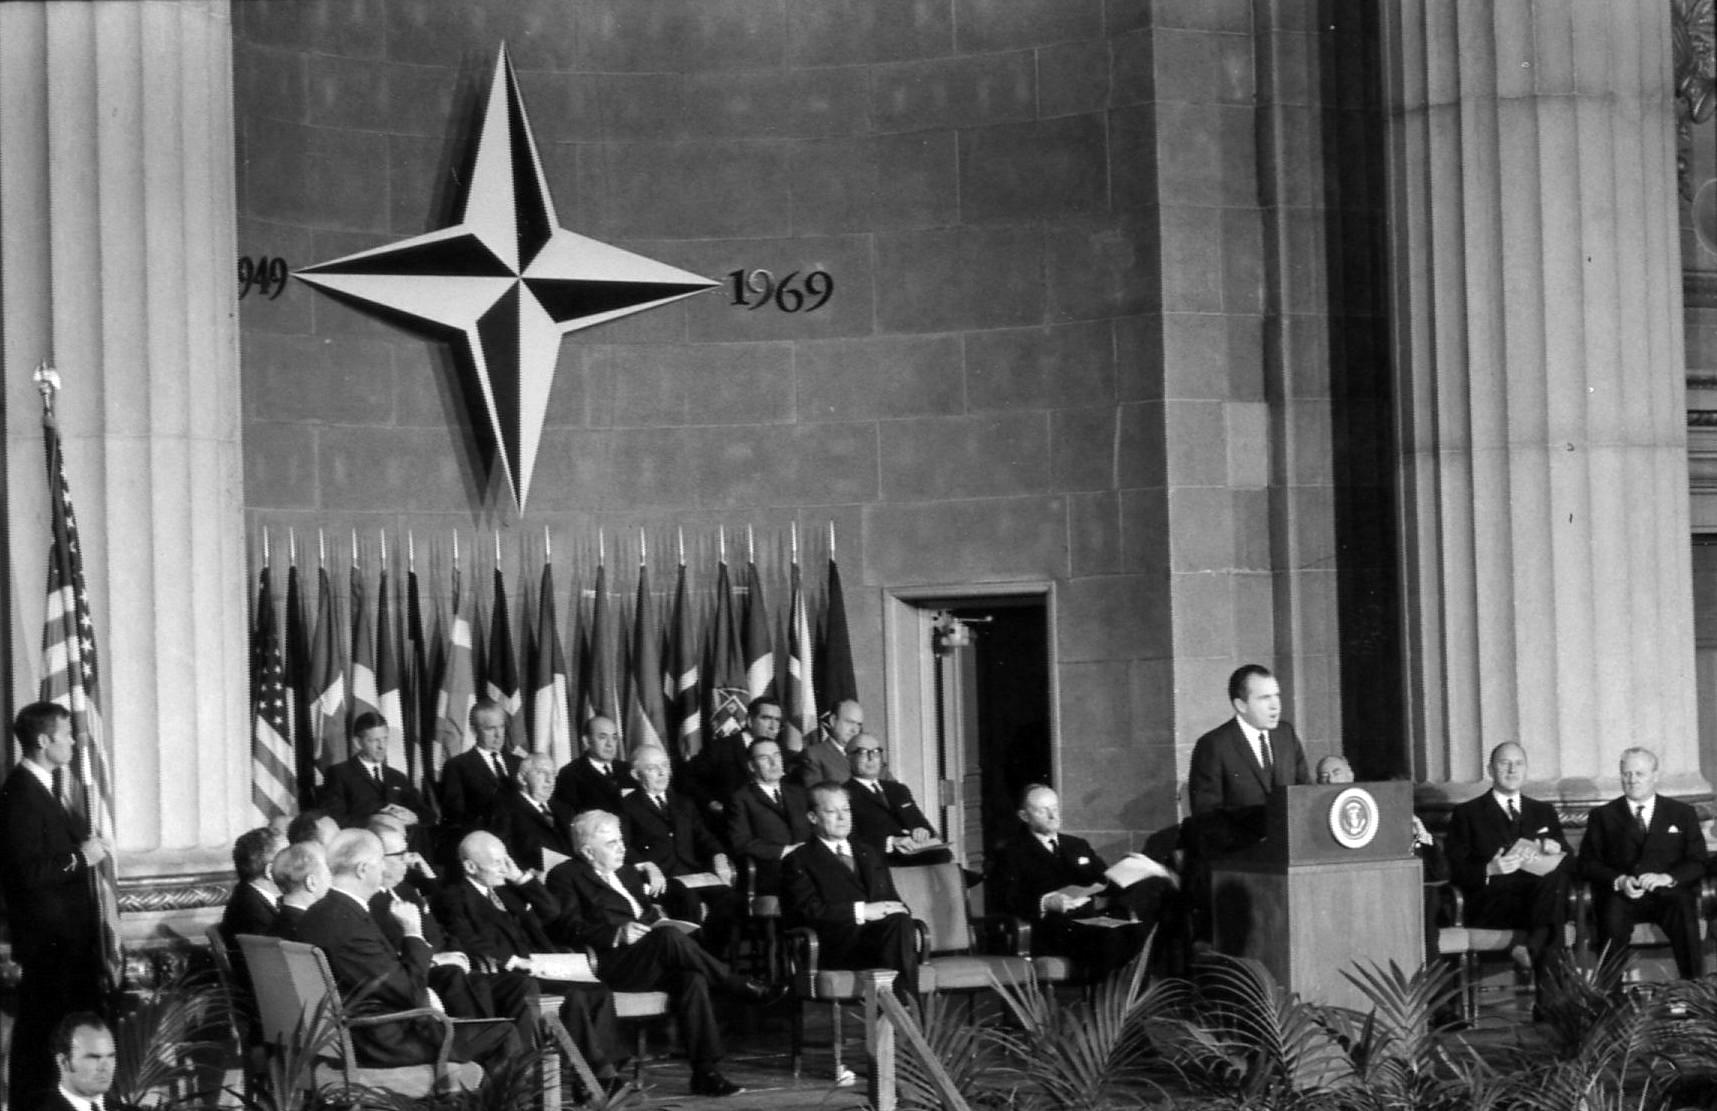 President Nixon addresses the commemorative session of the North Atlantic Council on April 10, 1969.